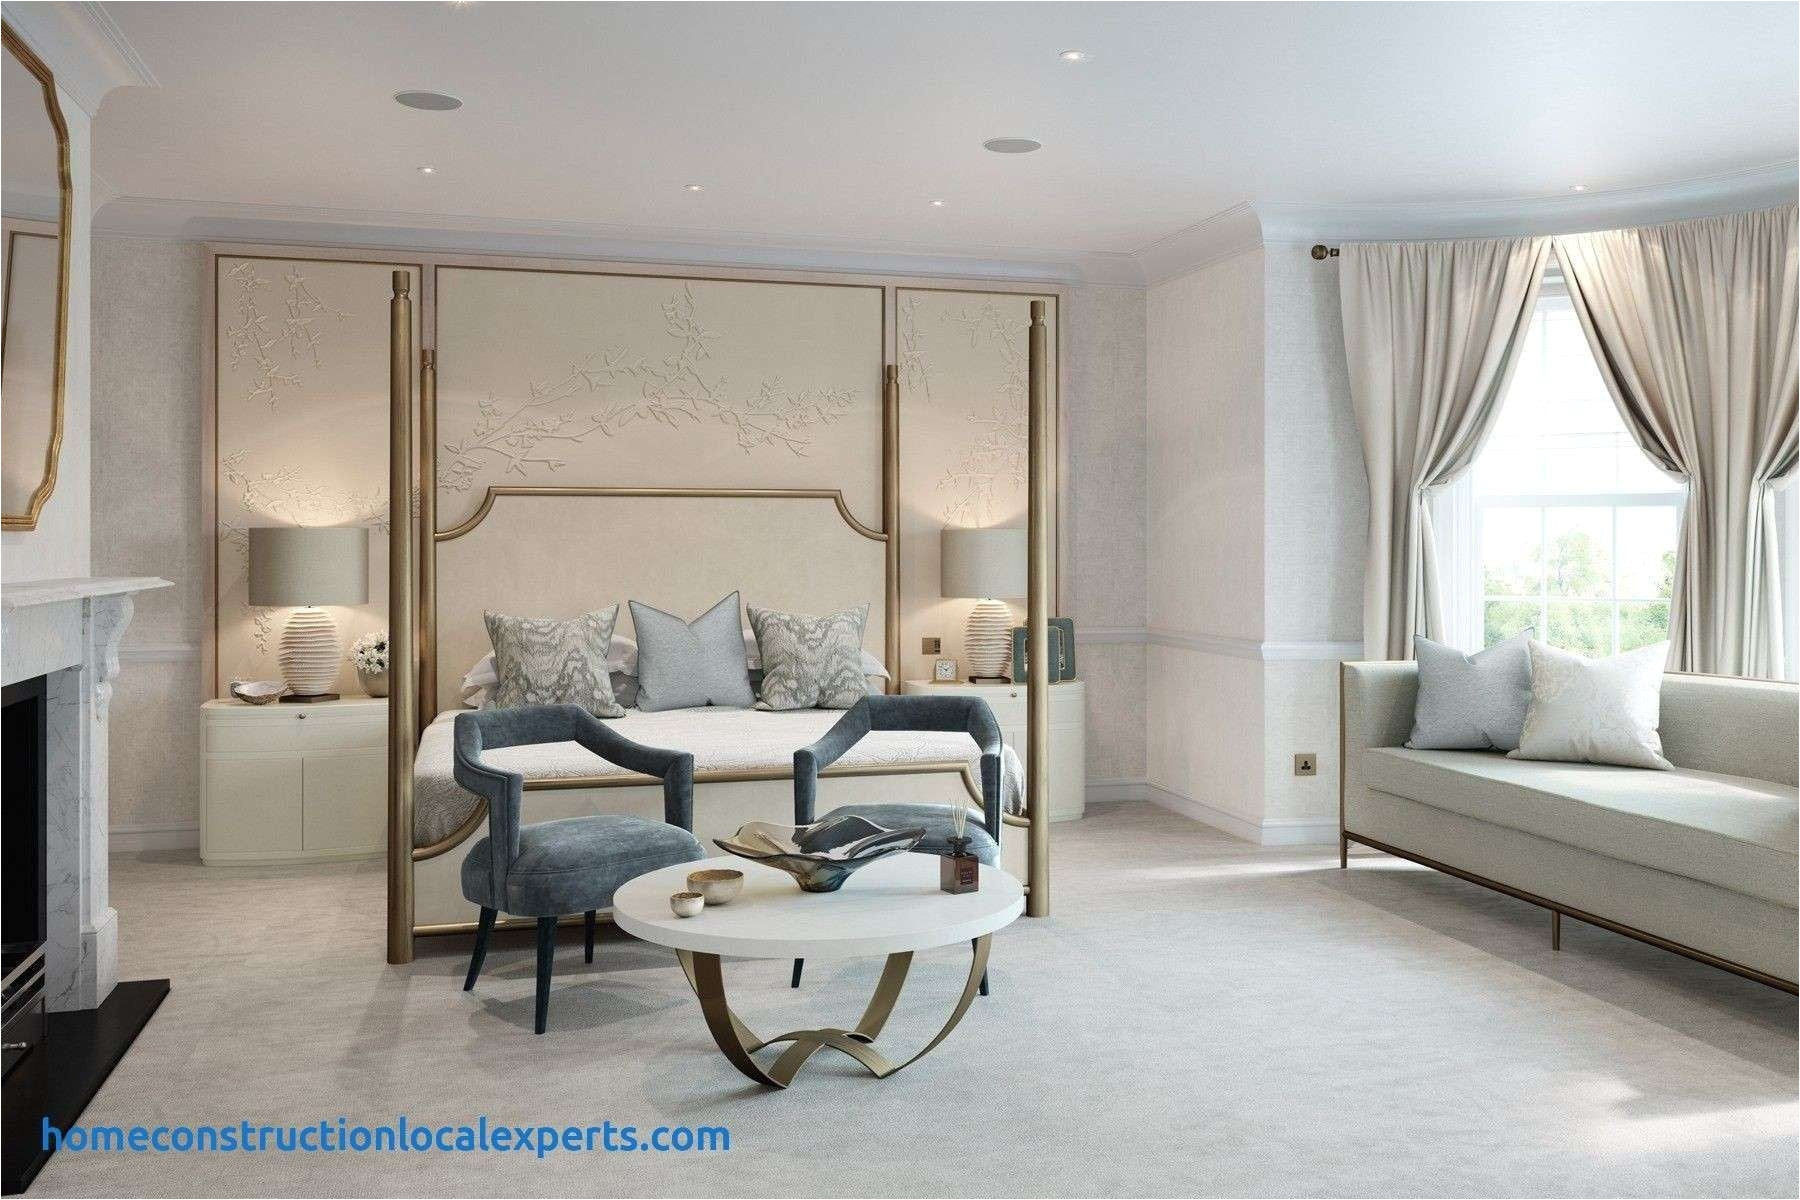 2 Bedroom Apartments In Oakley Cincinnati Bedroom Bedroom Apartments In Cincinnati Beautiful Reviews